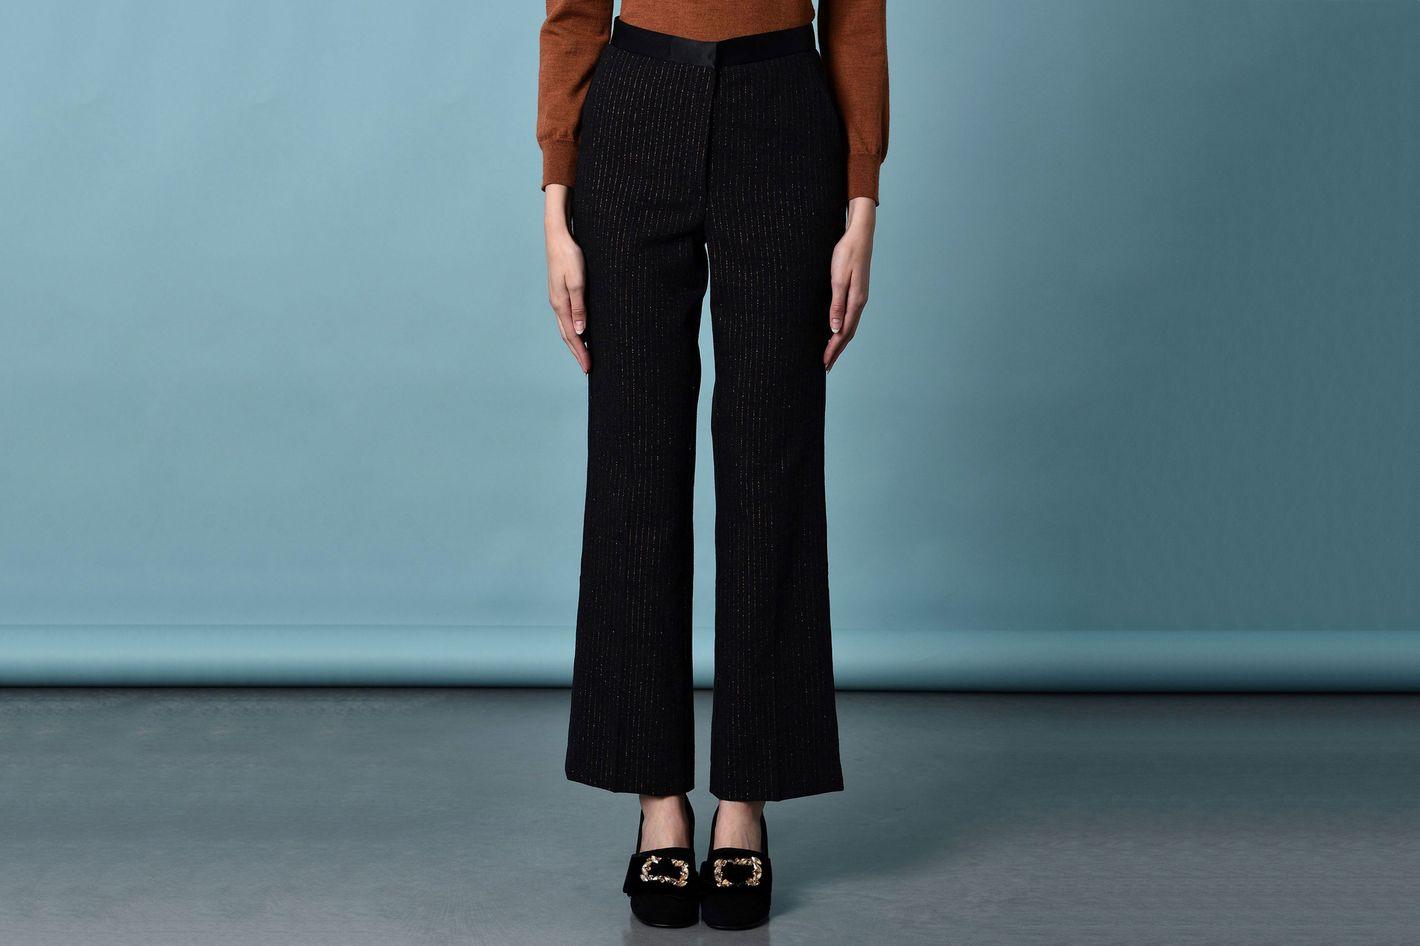 8 Casual Pinstripe Pants